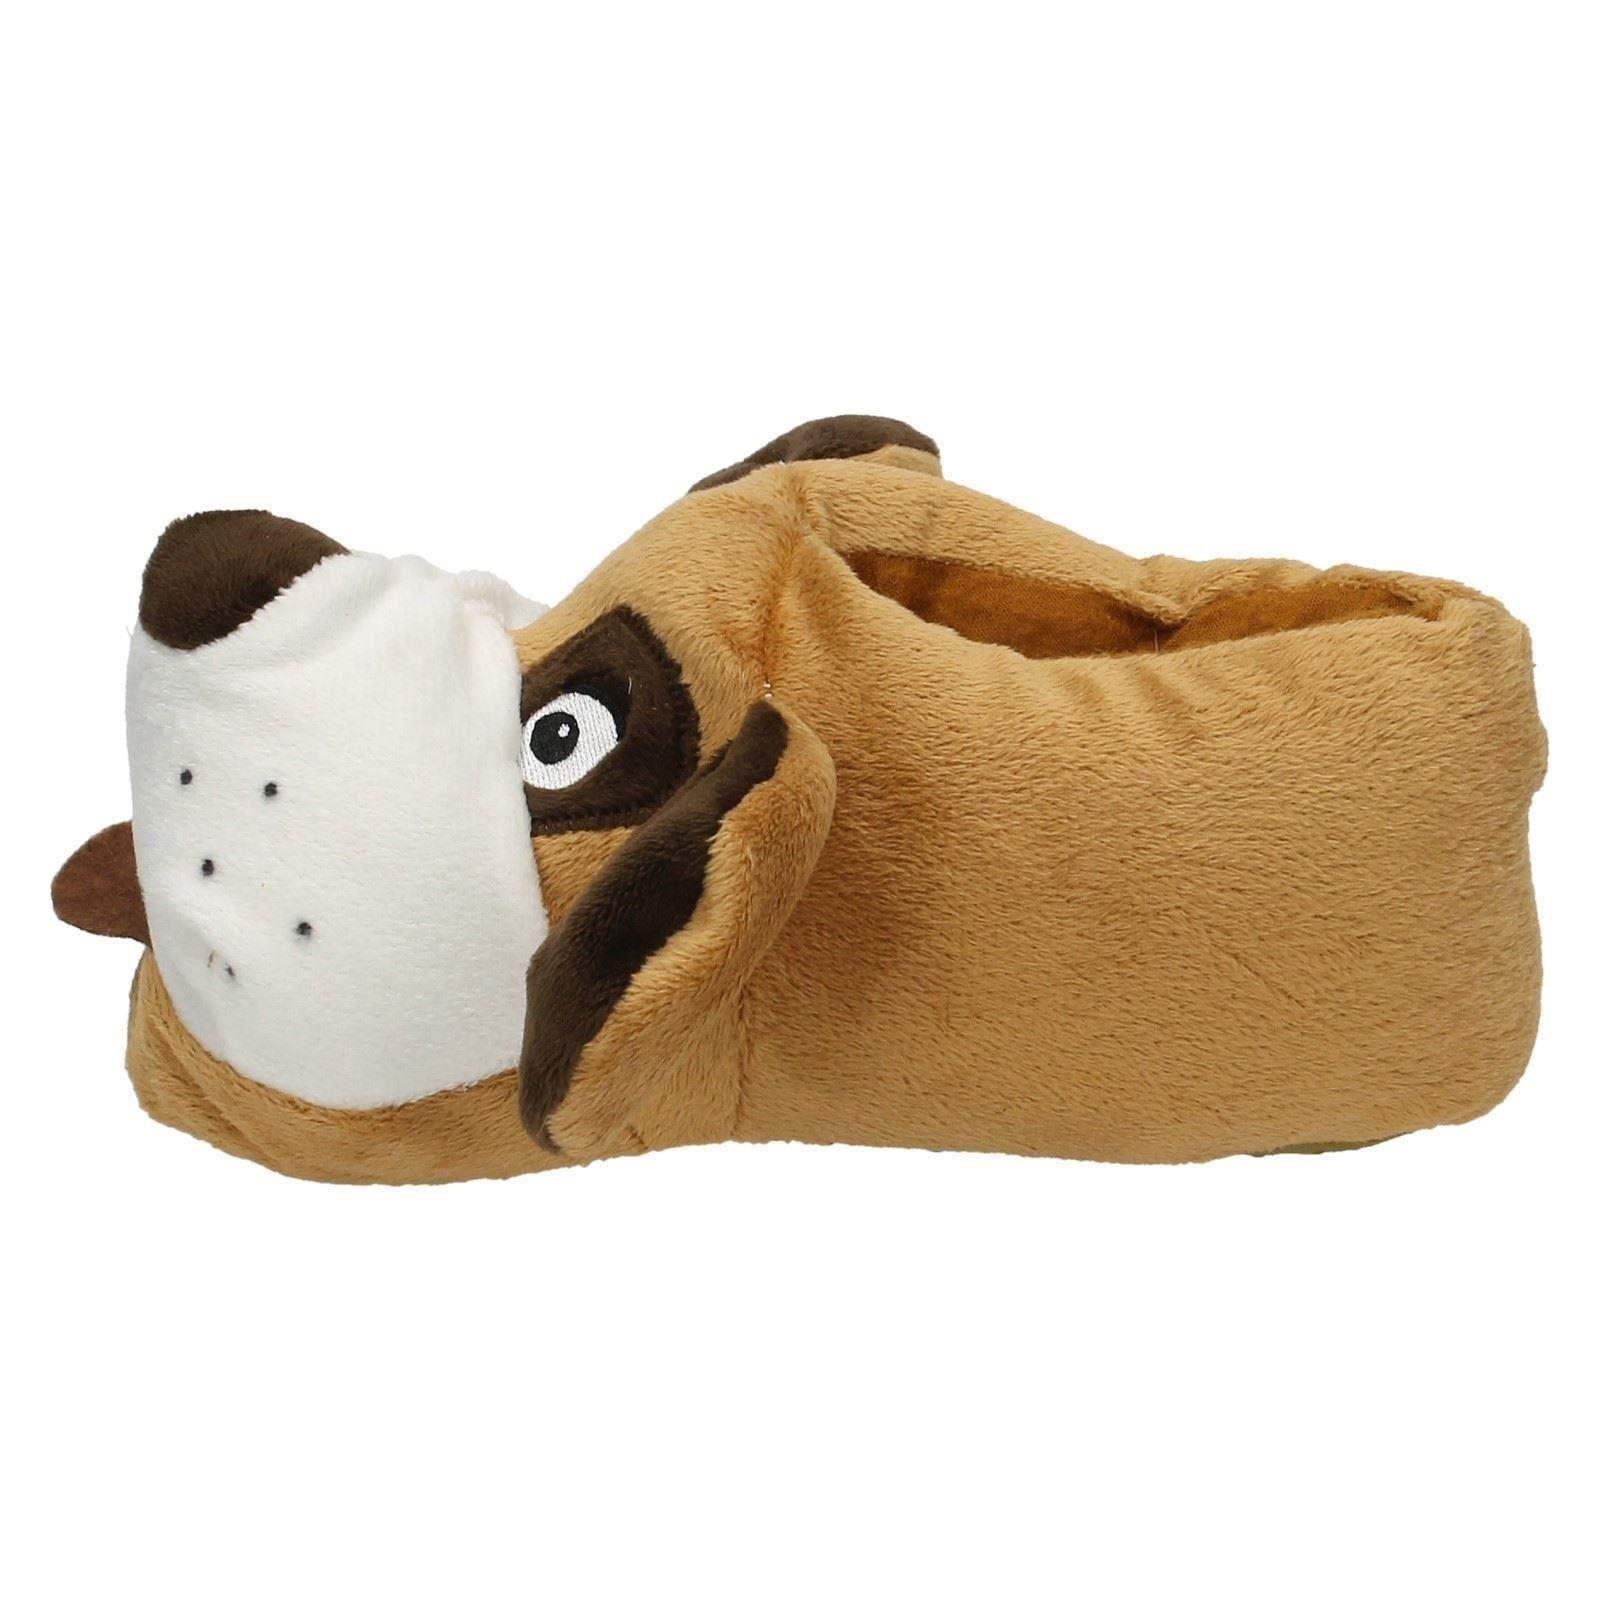 Unisex Boys Girls Kids Junior Spot On Flat Novelty 3D Soft Dog Slippers - X2073